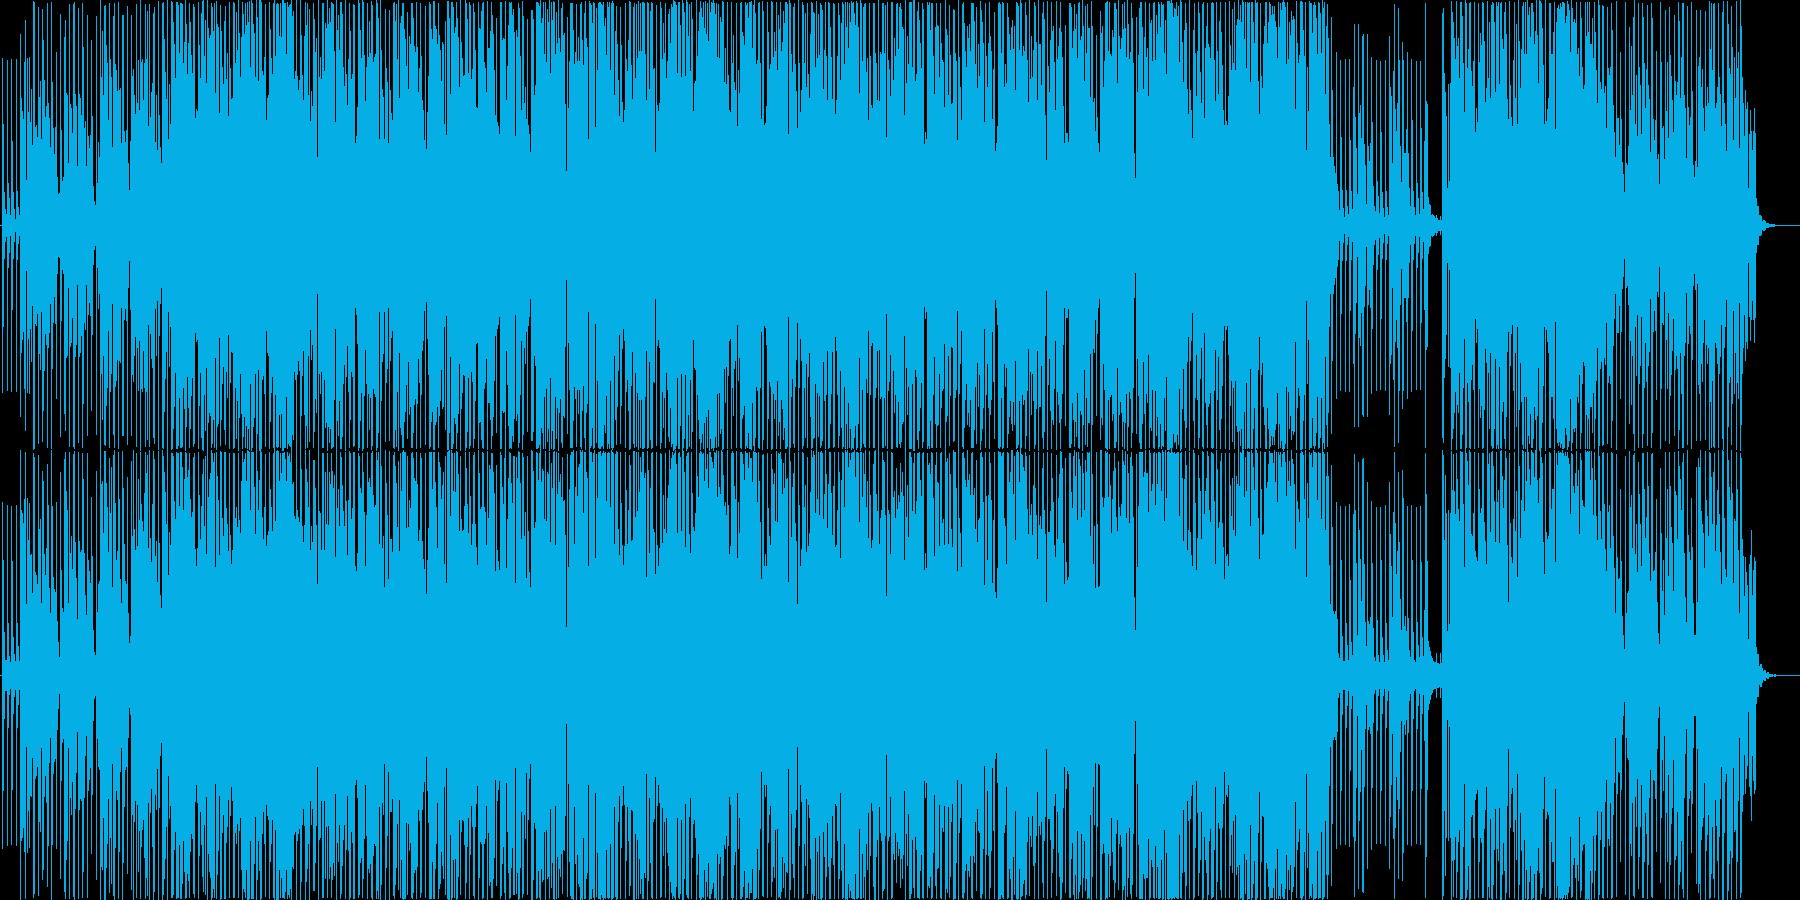 Vaporwaveポップ 夏の恋の終わりの再生済みの波形